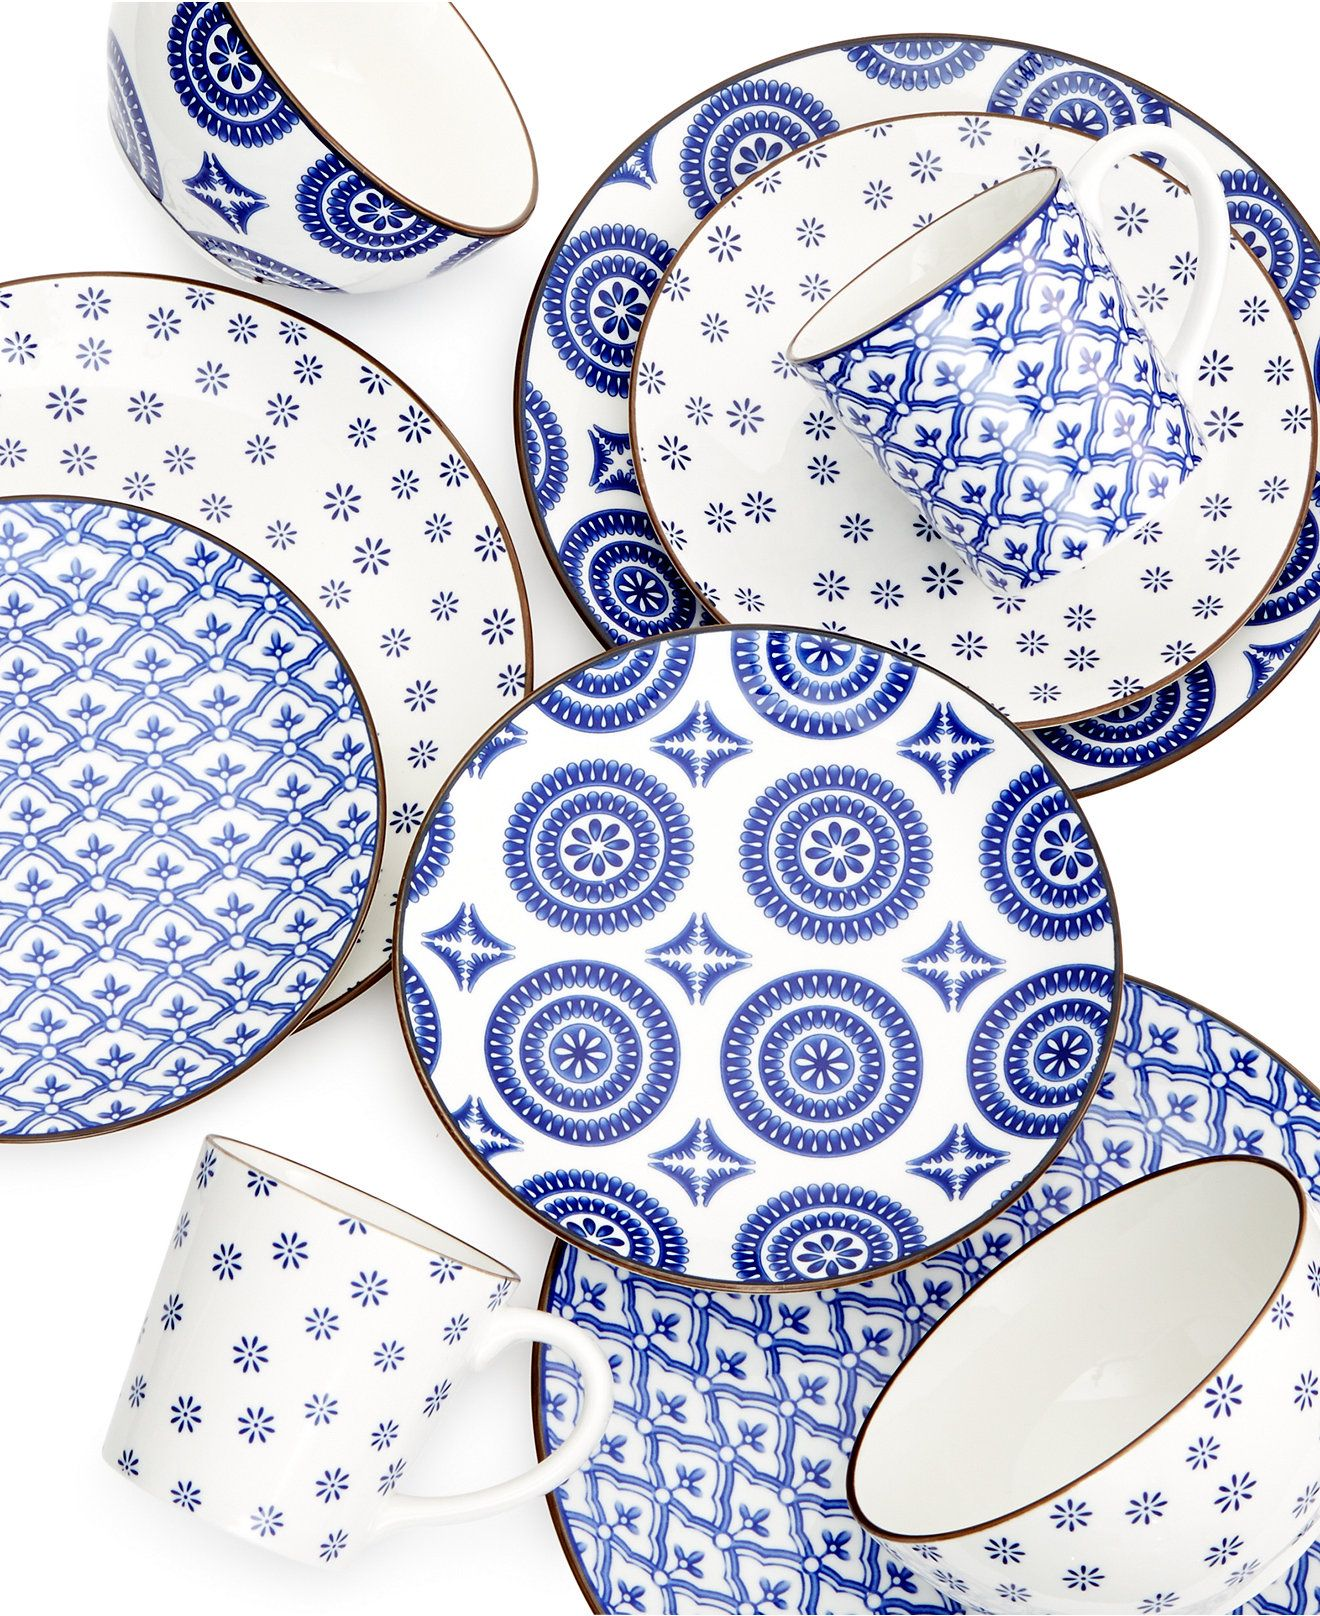 Gibson Blue and White Dinnerware Collection - Dinnerware - Dining \u0026 Entertaining - Macy\u0027s  sc 1 st  Pinterest & Gibson Blue and White Dinnerware Collection - Dinnerware - Dining ...